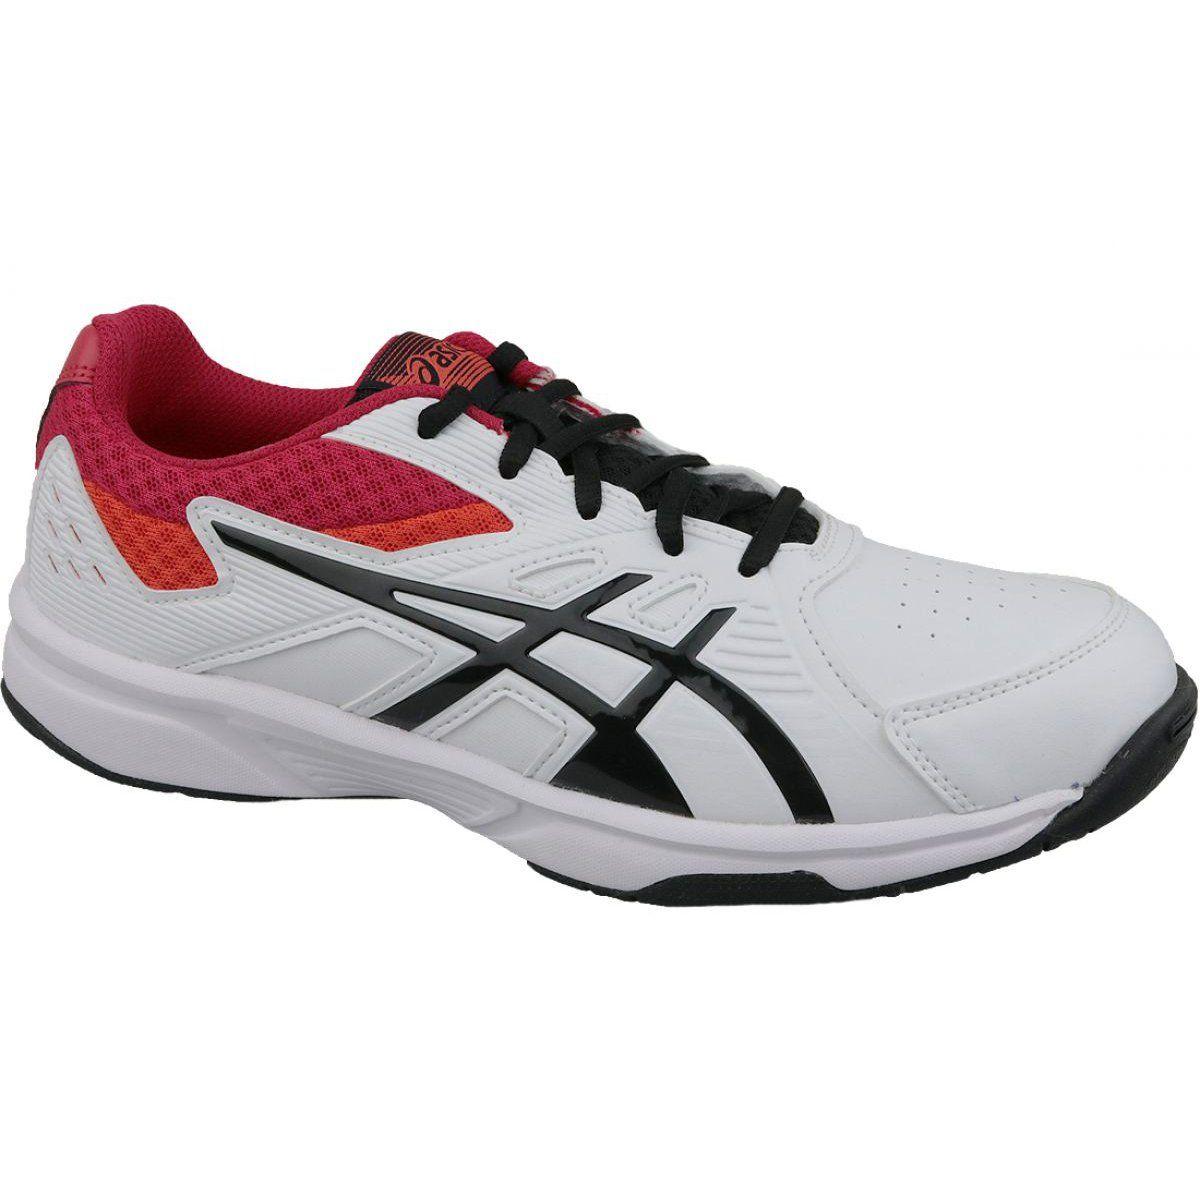 Asics Court Slide M 1041a037 102 Tennis Shoes White Tennis Shoes Asics Buy Shoes